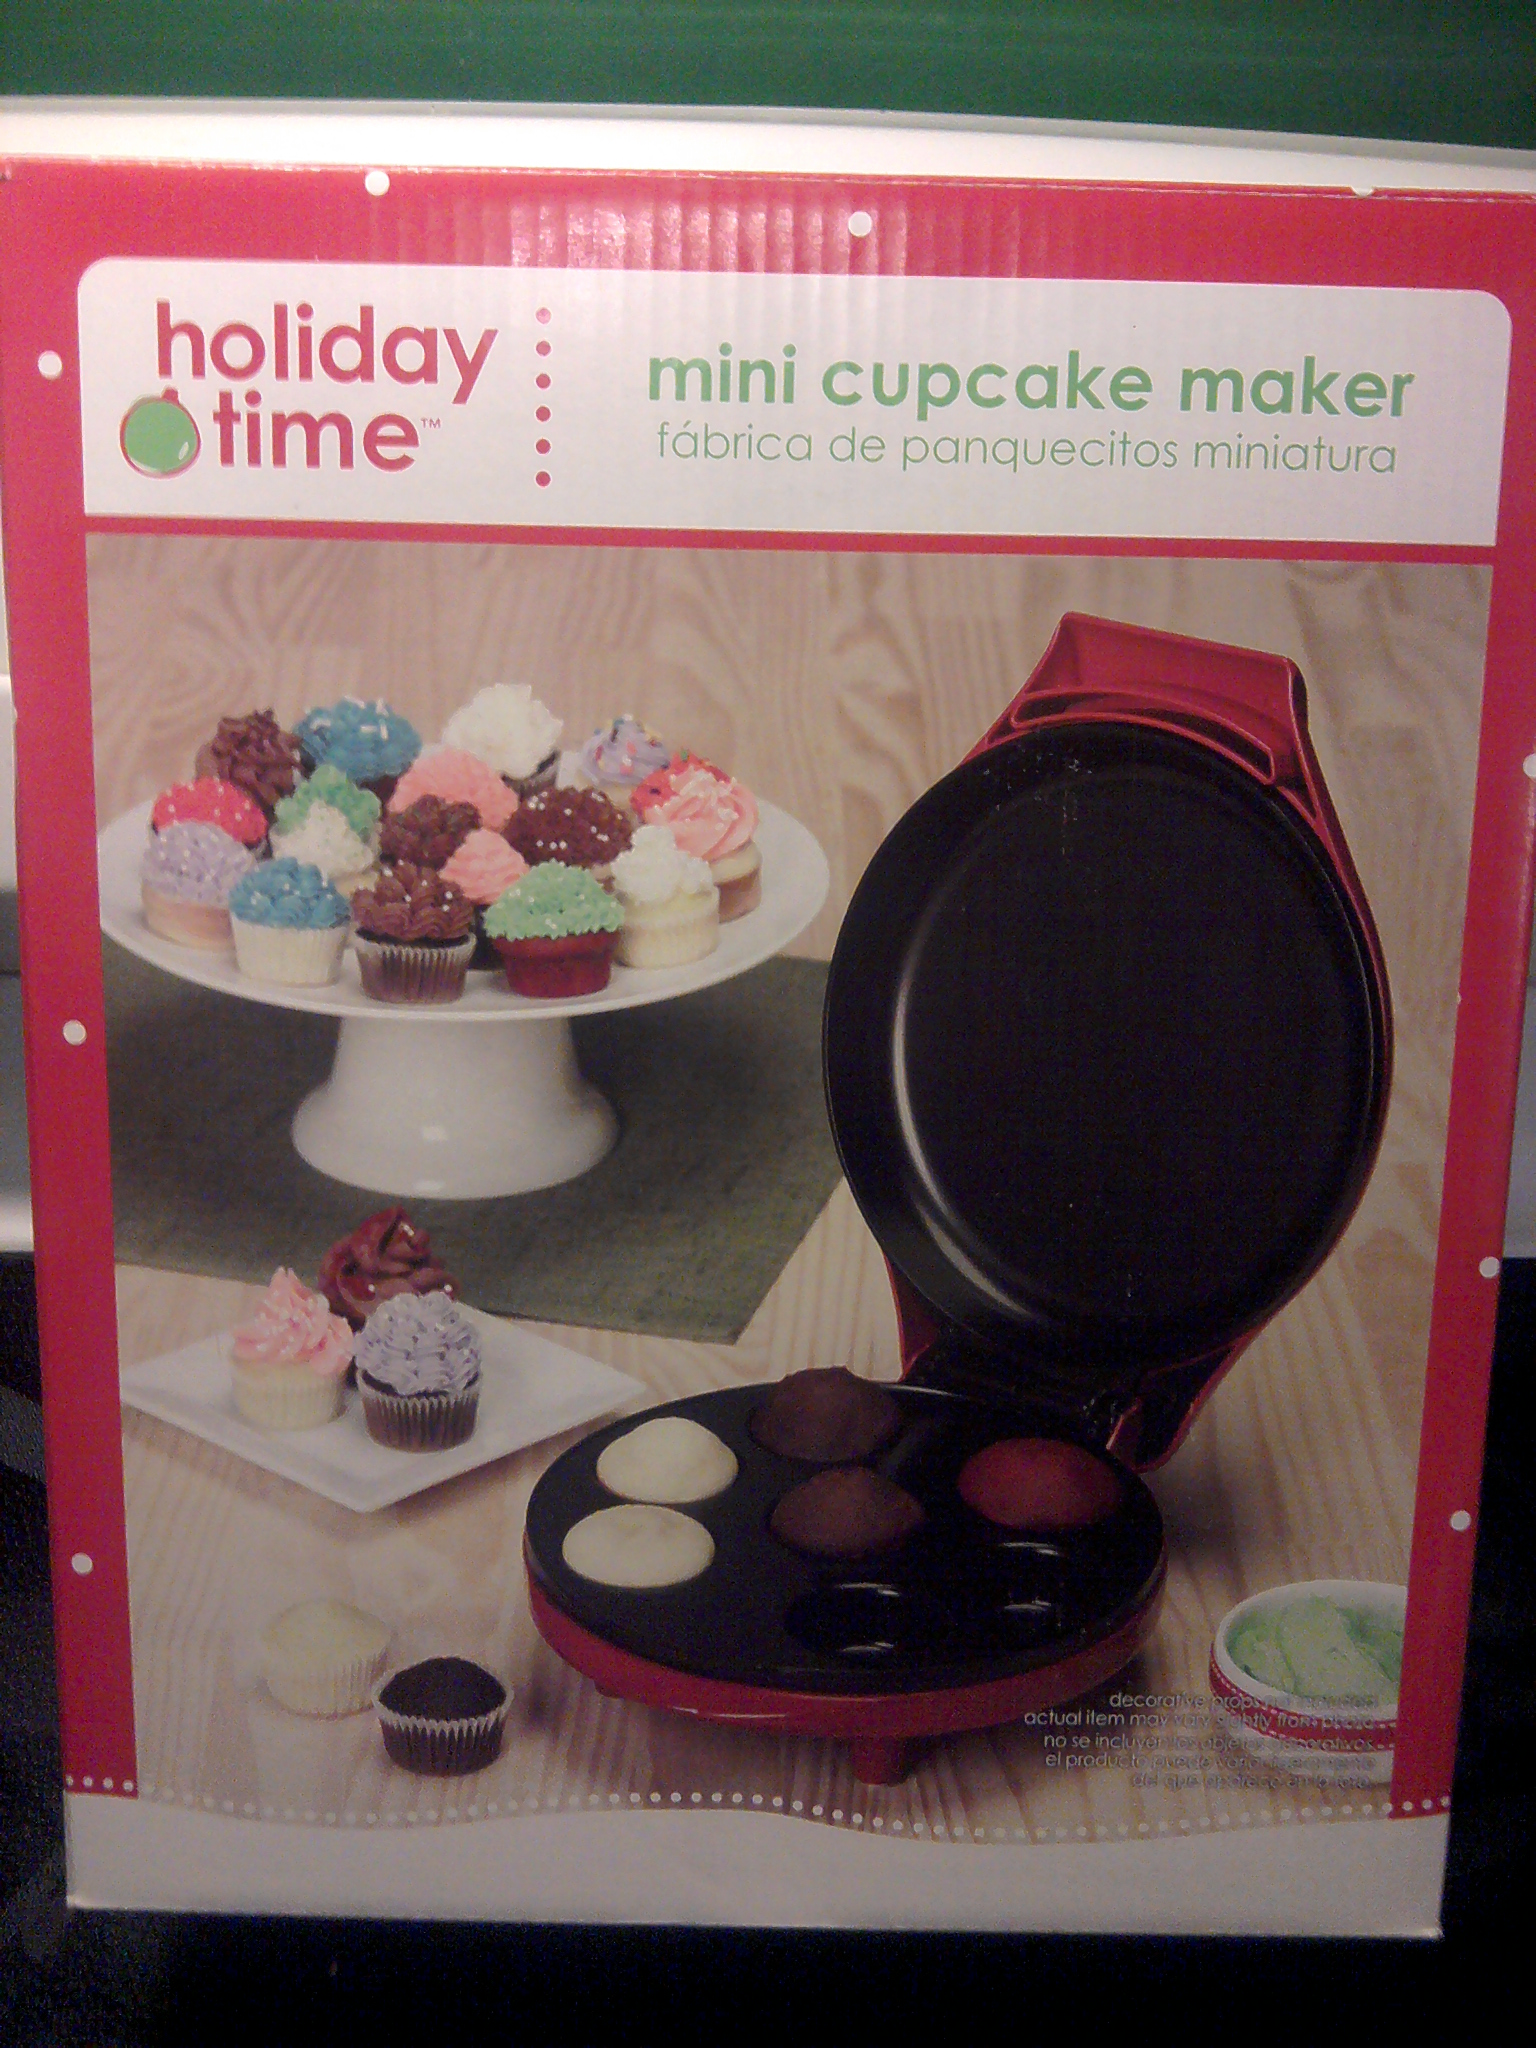 Holiday Time Mini Cupcake Maker - All Things Cupcake